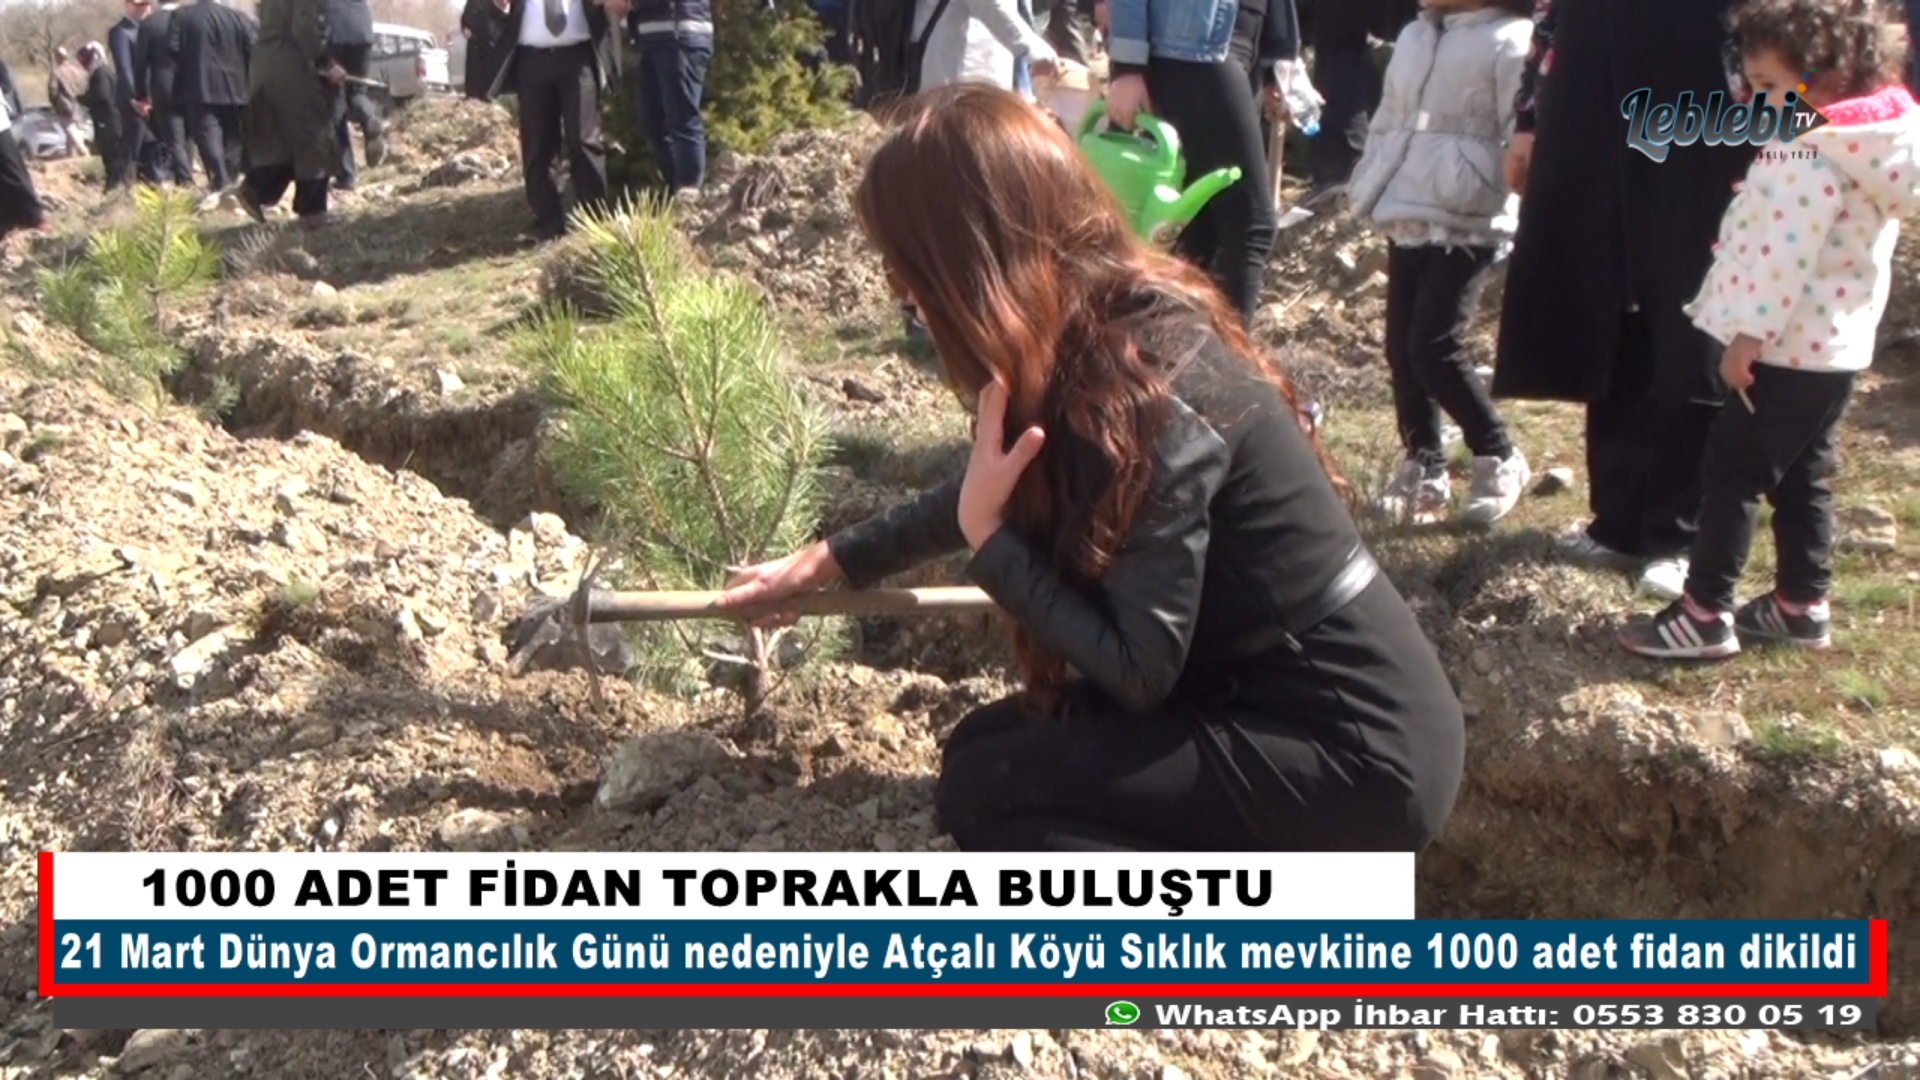 1000 ADET FİDAN TOPRAKLA BULUŞTU